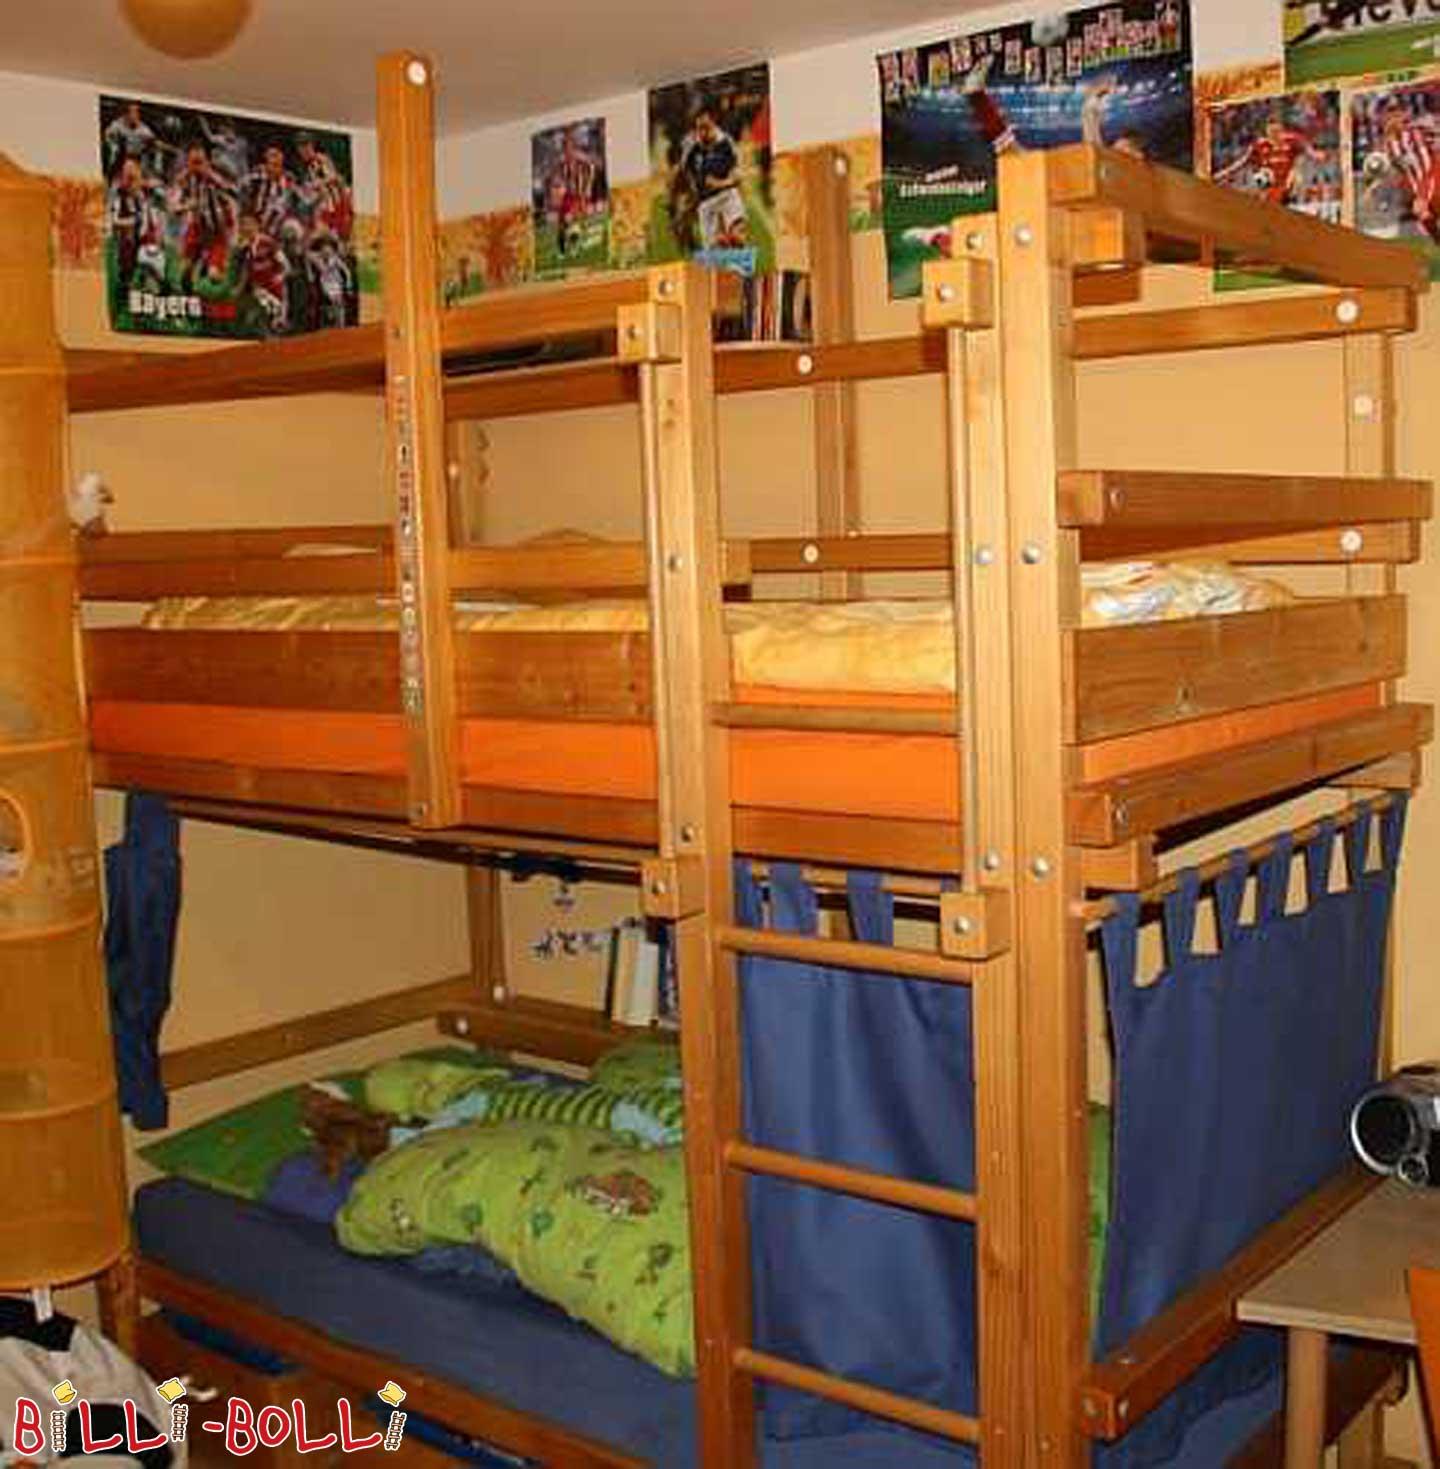 Segunda mano p gina 223 muebles infantiles de billi bolli for Segunda mano muebles infantiles